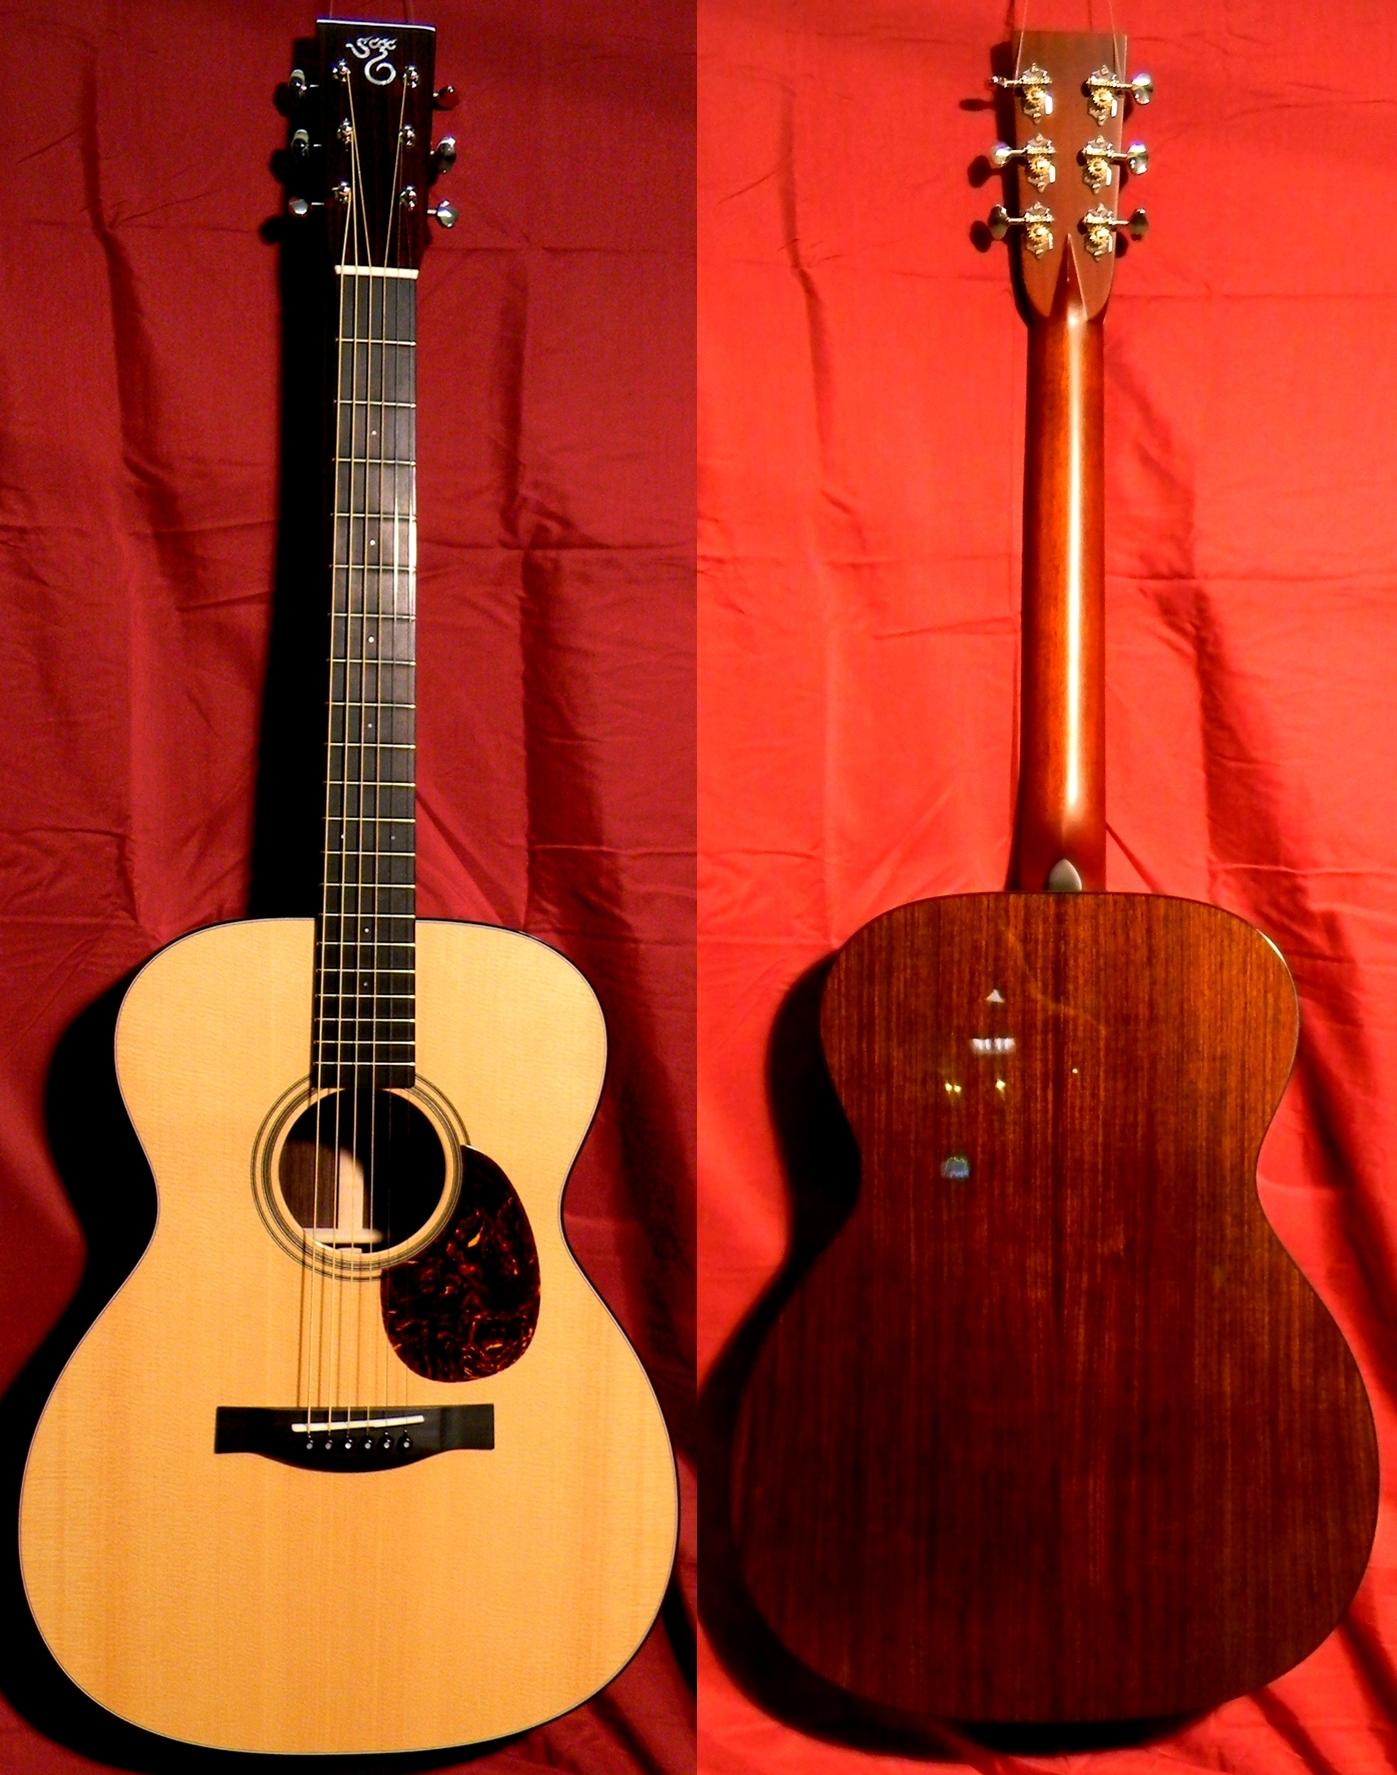 ompw santa cruz san antonio guitar store guitar tex. Black Bedroom Furniture Sets. Home Design Ideas